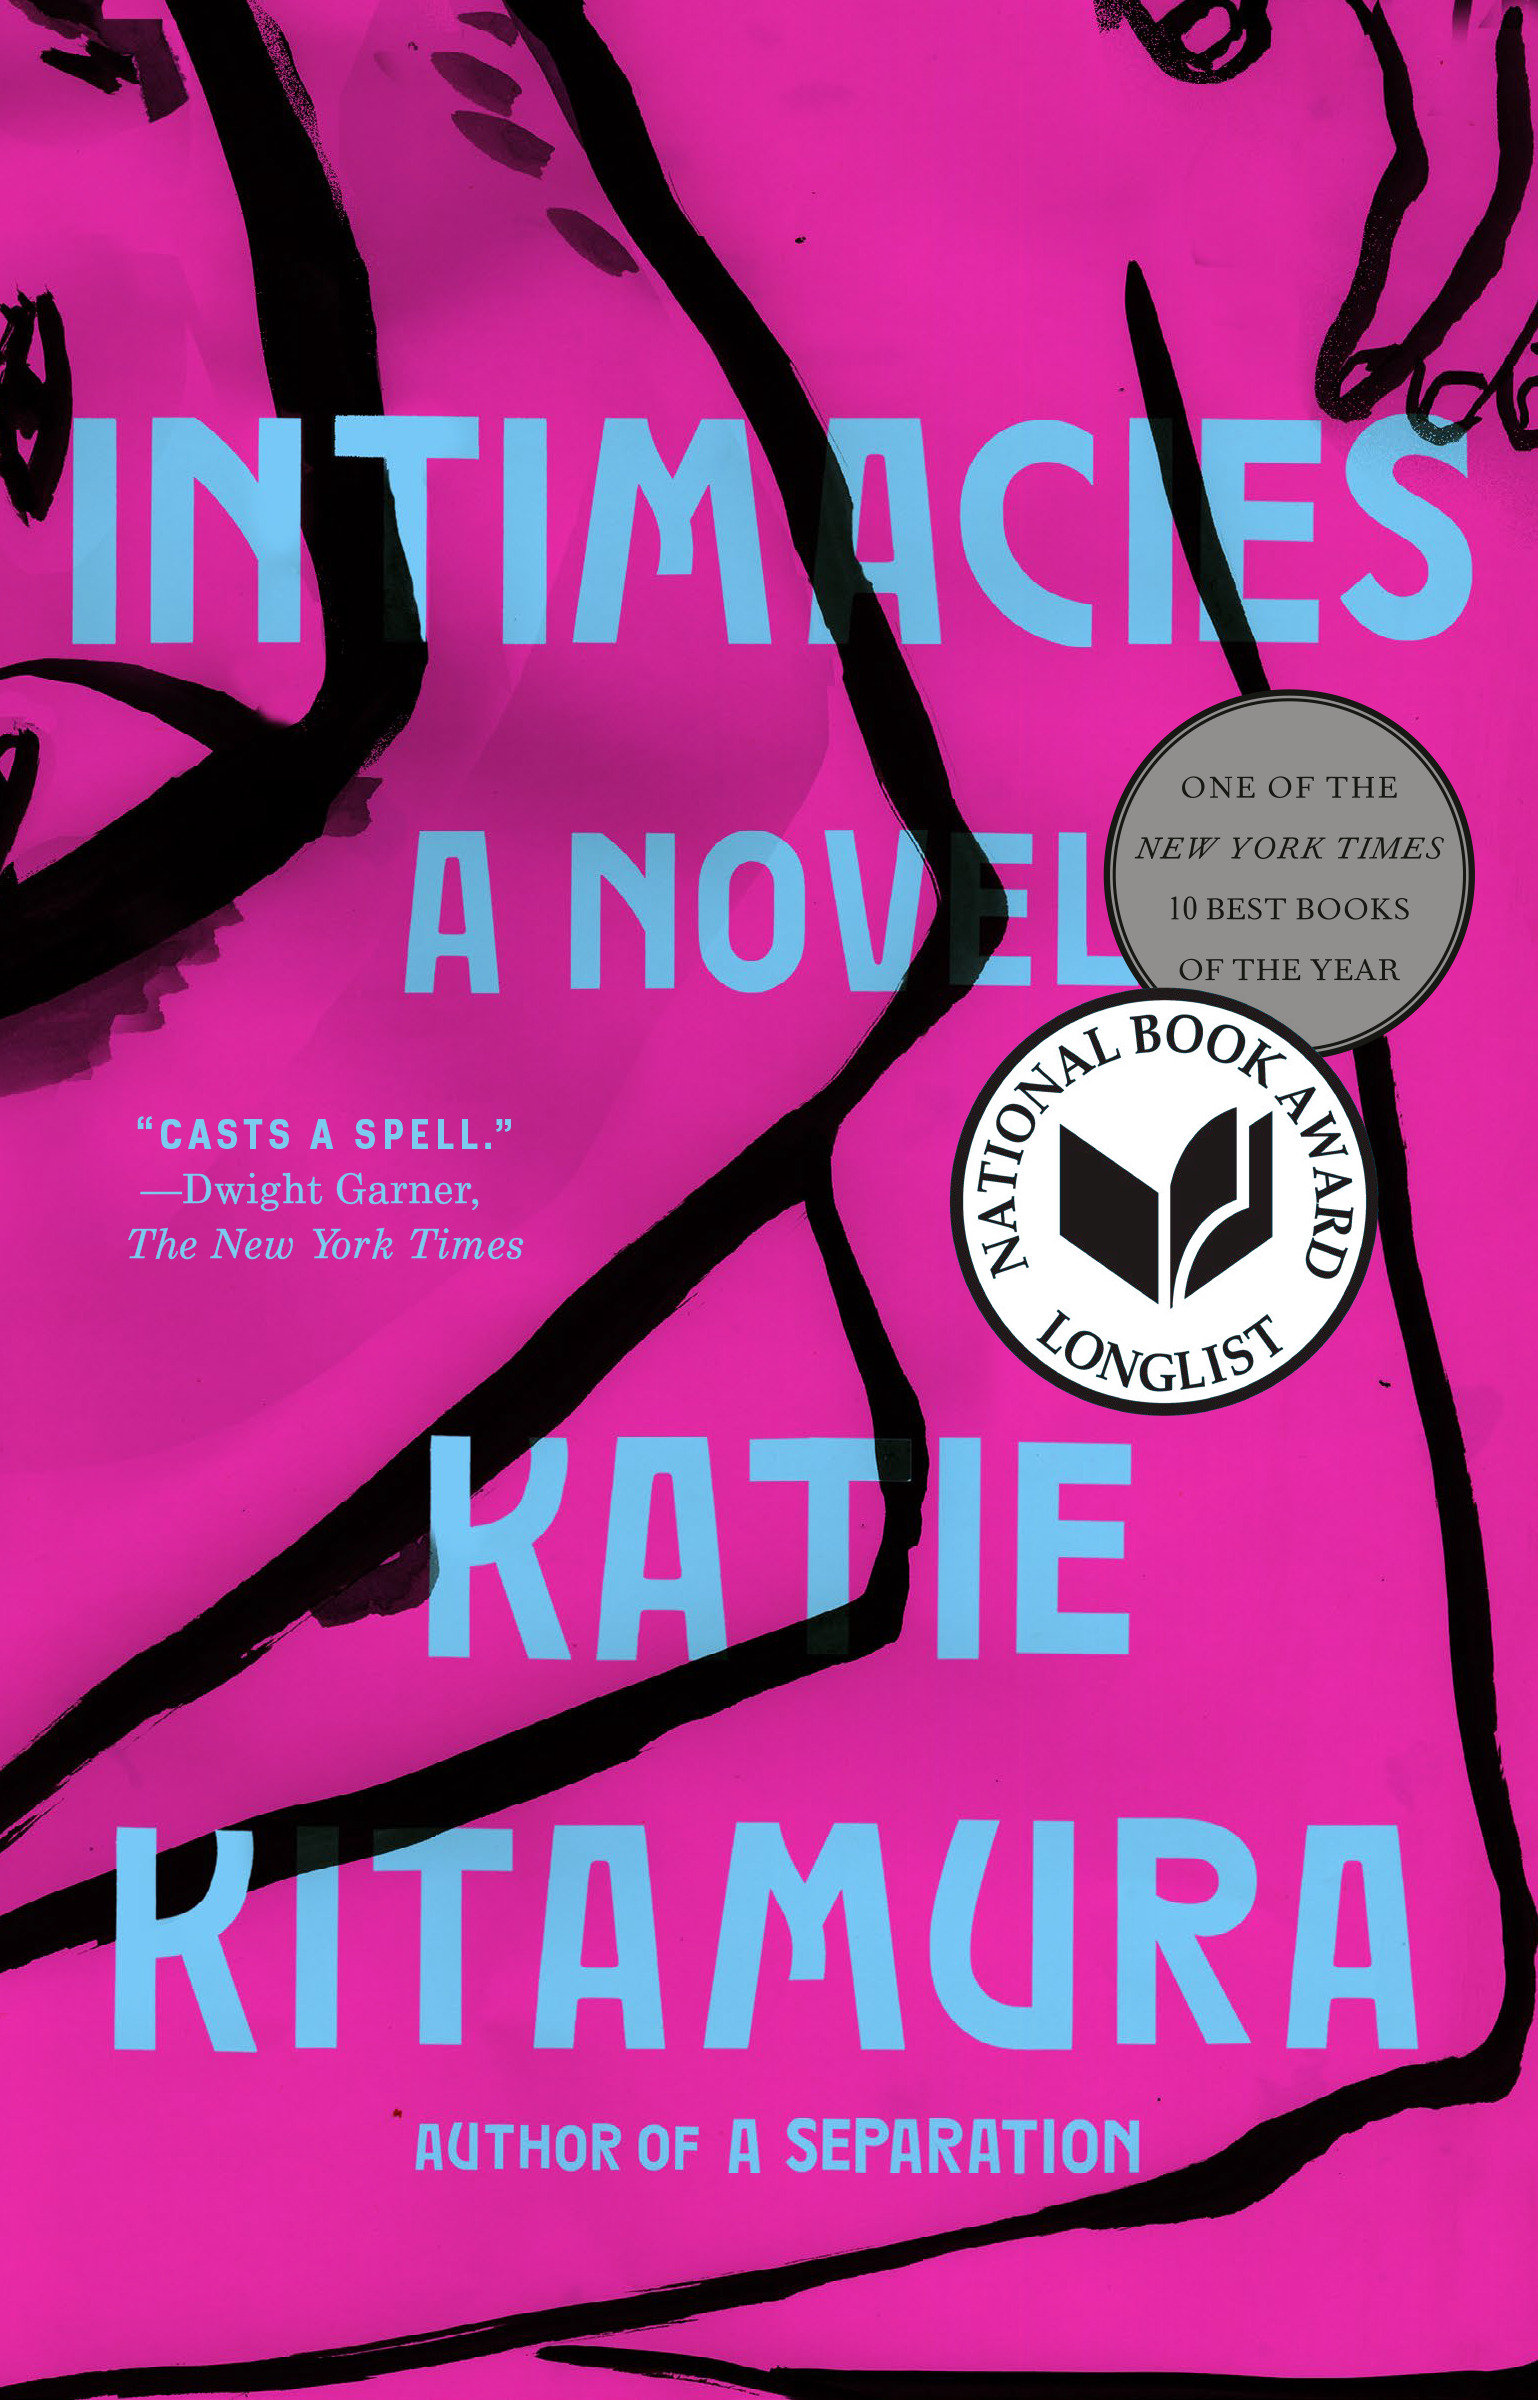 Intimacies A Novel